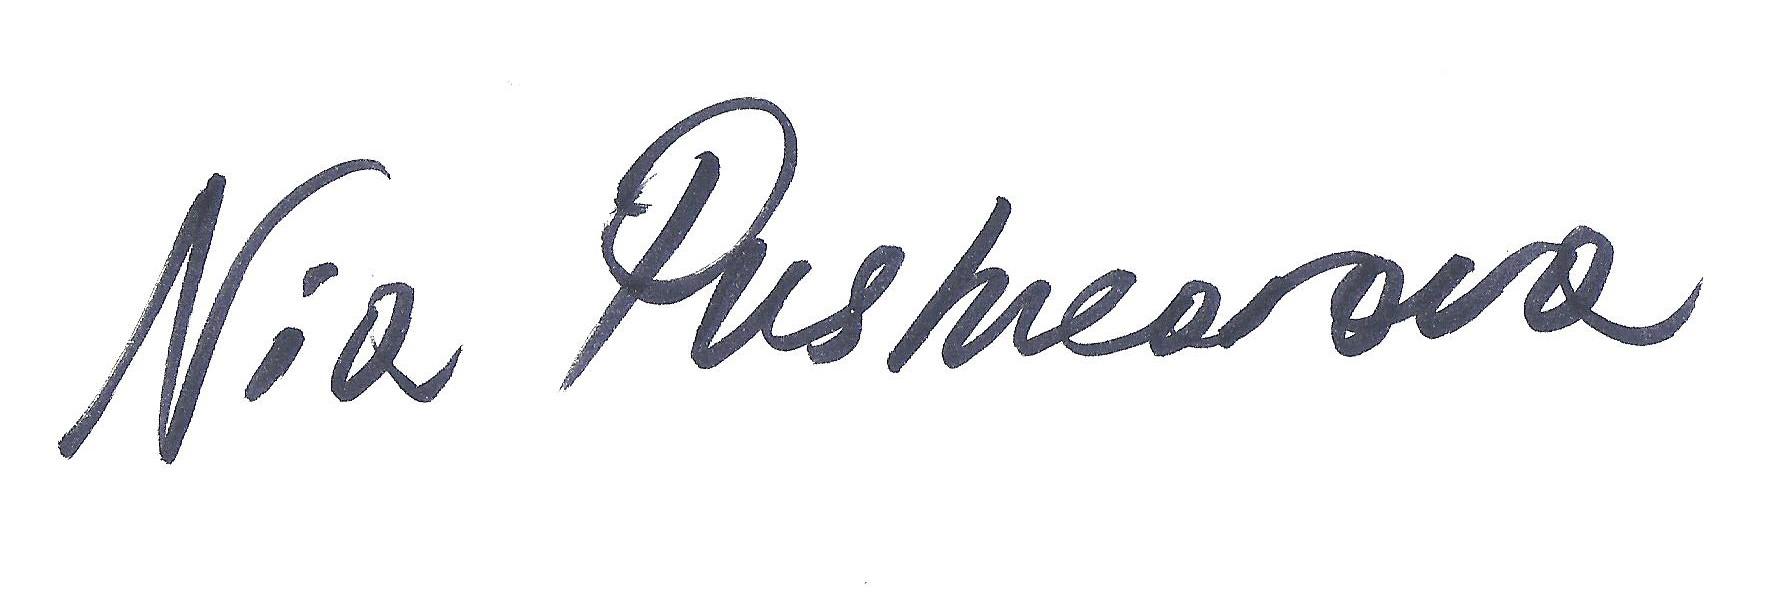 Nia Pushkarova Signature